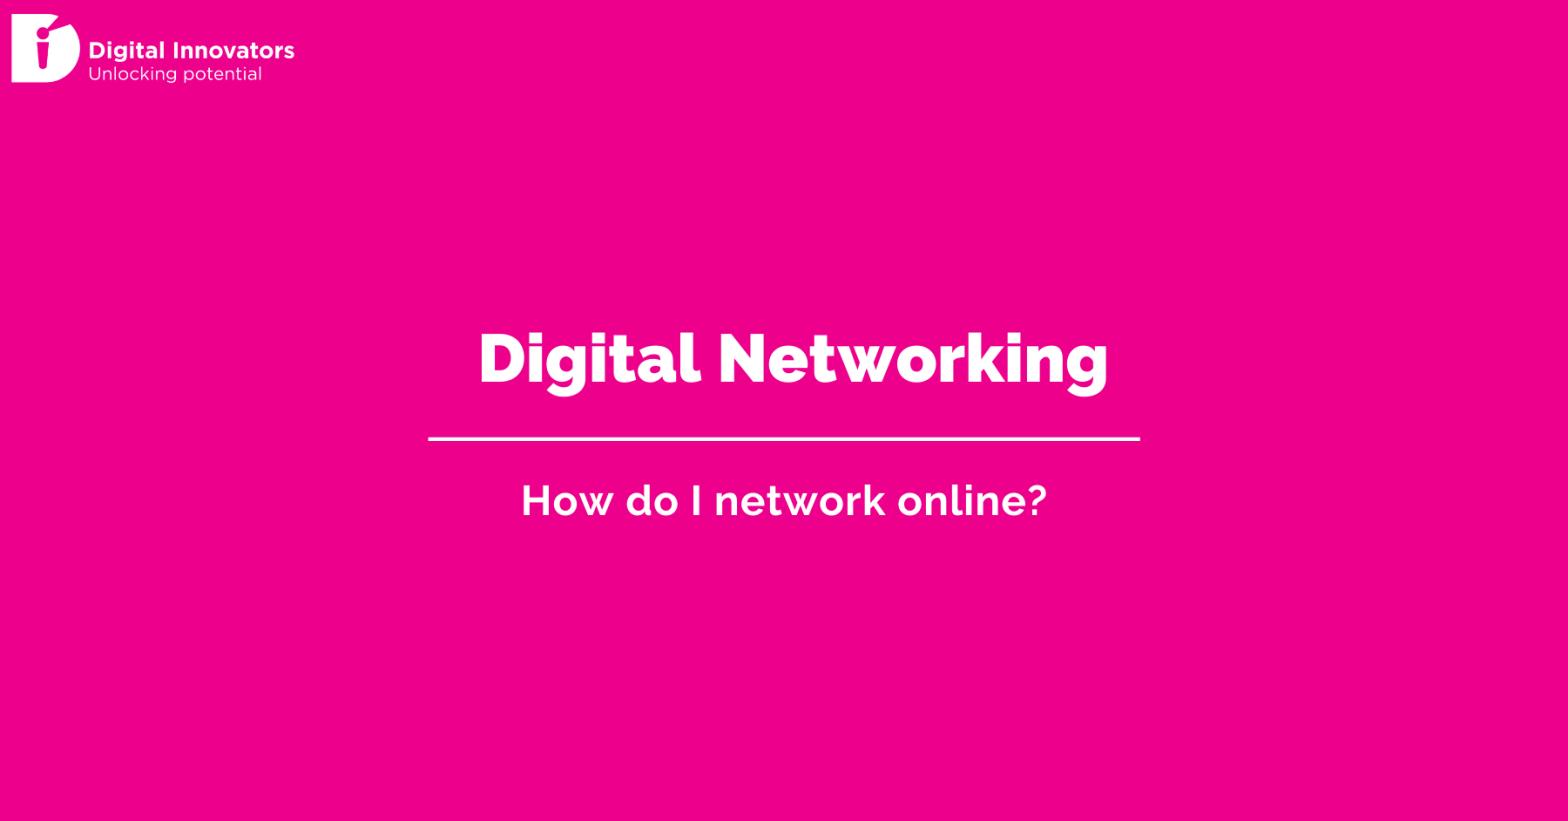 Digital Networking - How do I network online?